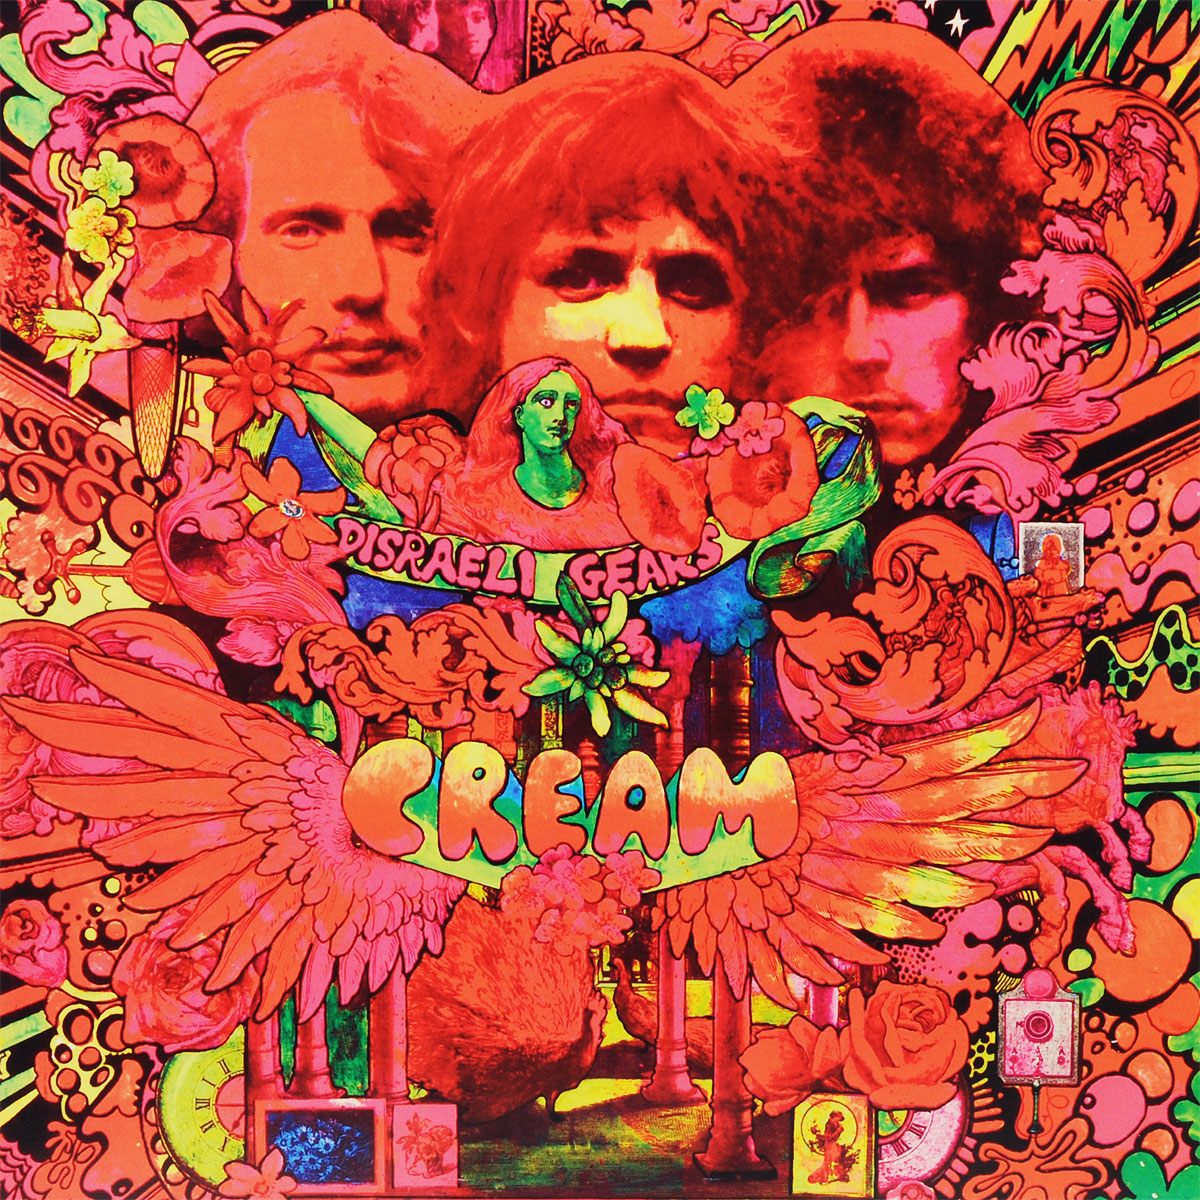 Cream Cream. Disraeli Gears (LP) гель лаки planet nails гель краска без липкого слоя planet nails paint gel зеленая 5г